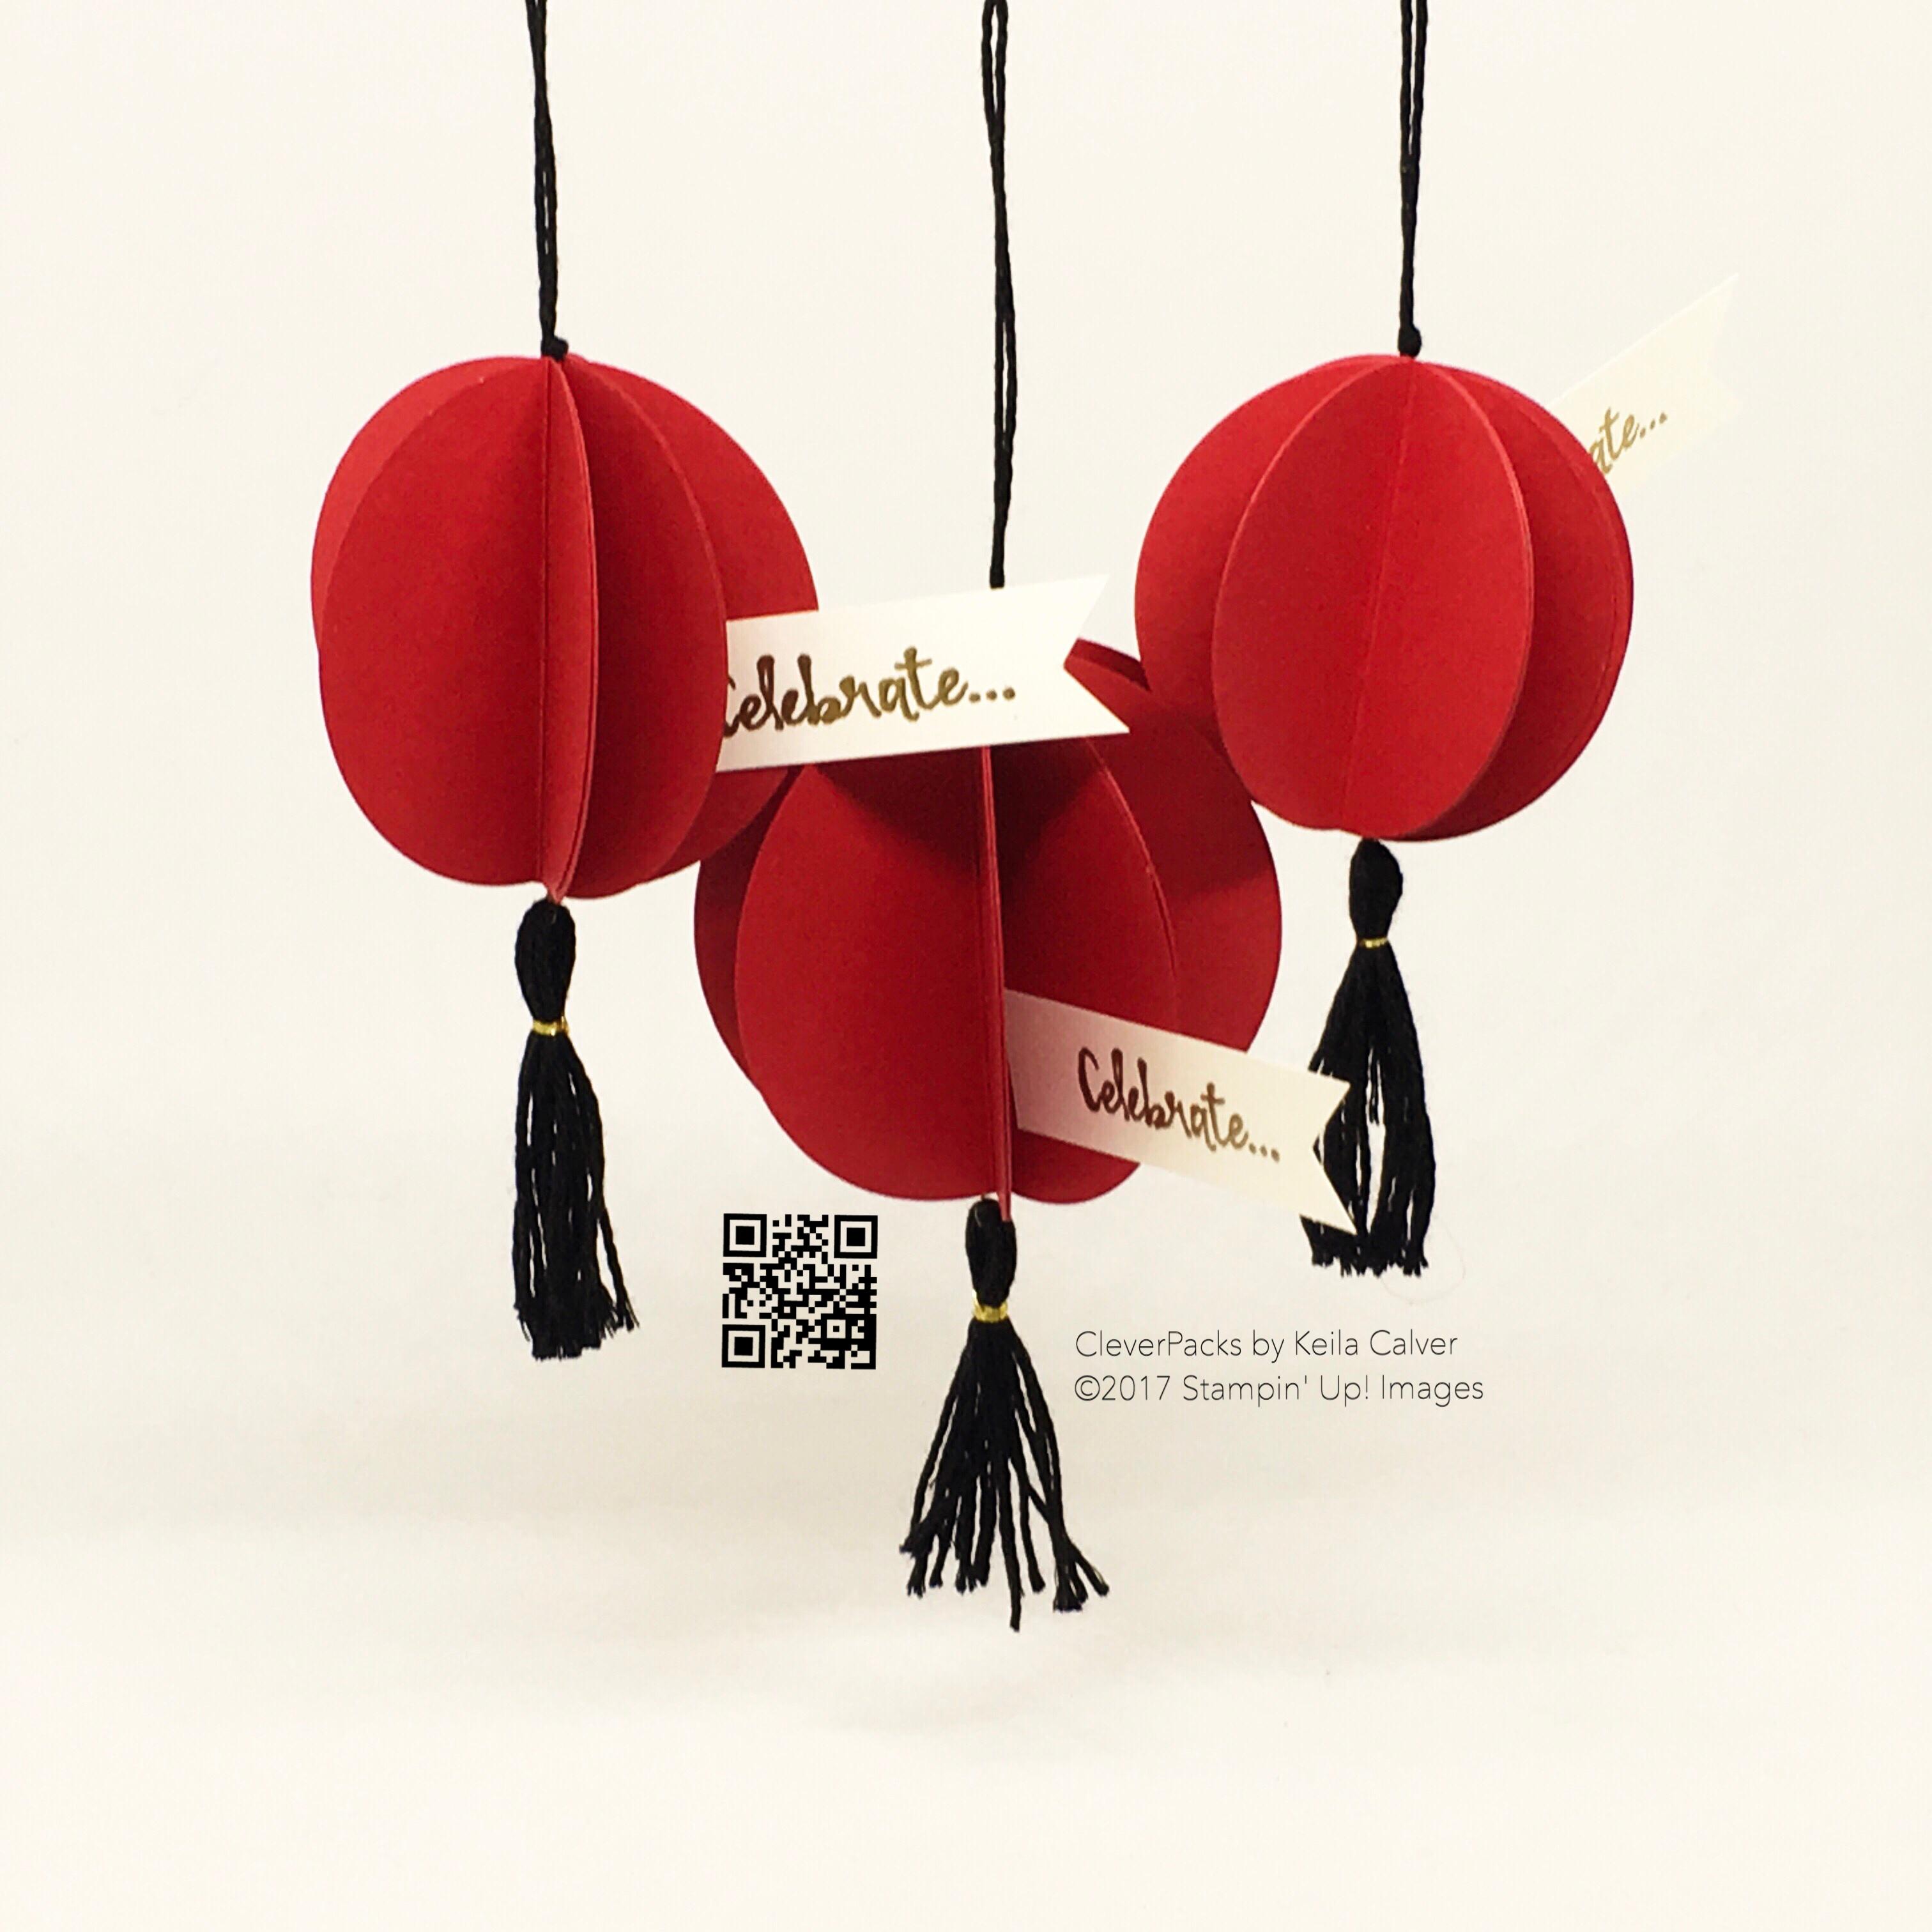 http://www.keilacalver.co.uk/en/chinese-new-year-lantern ...